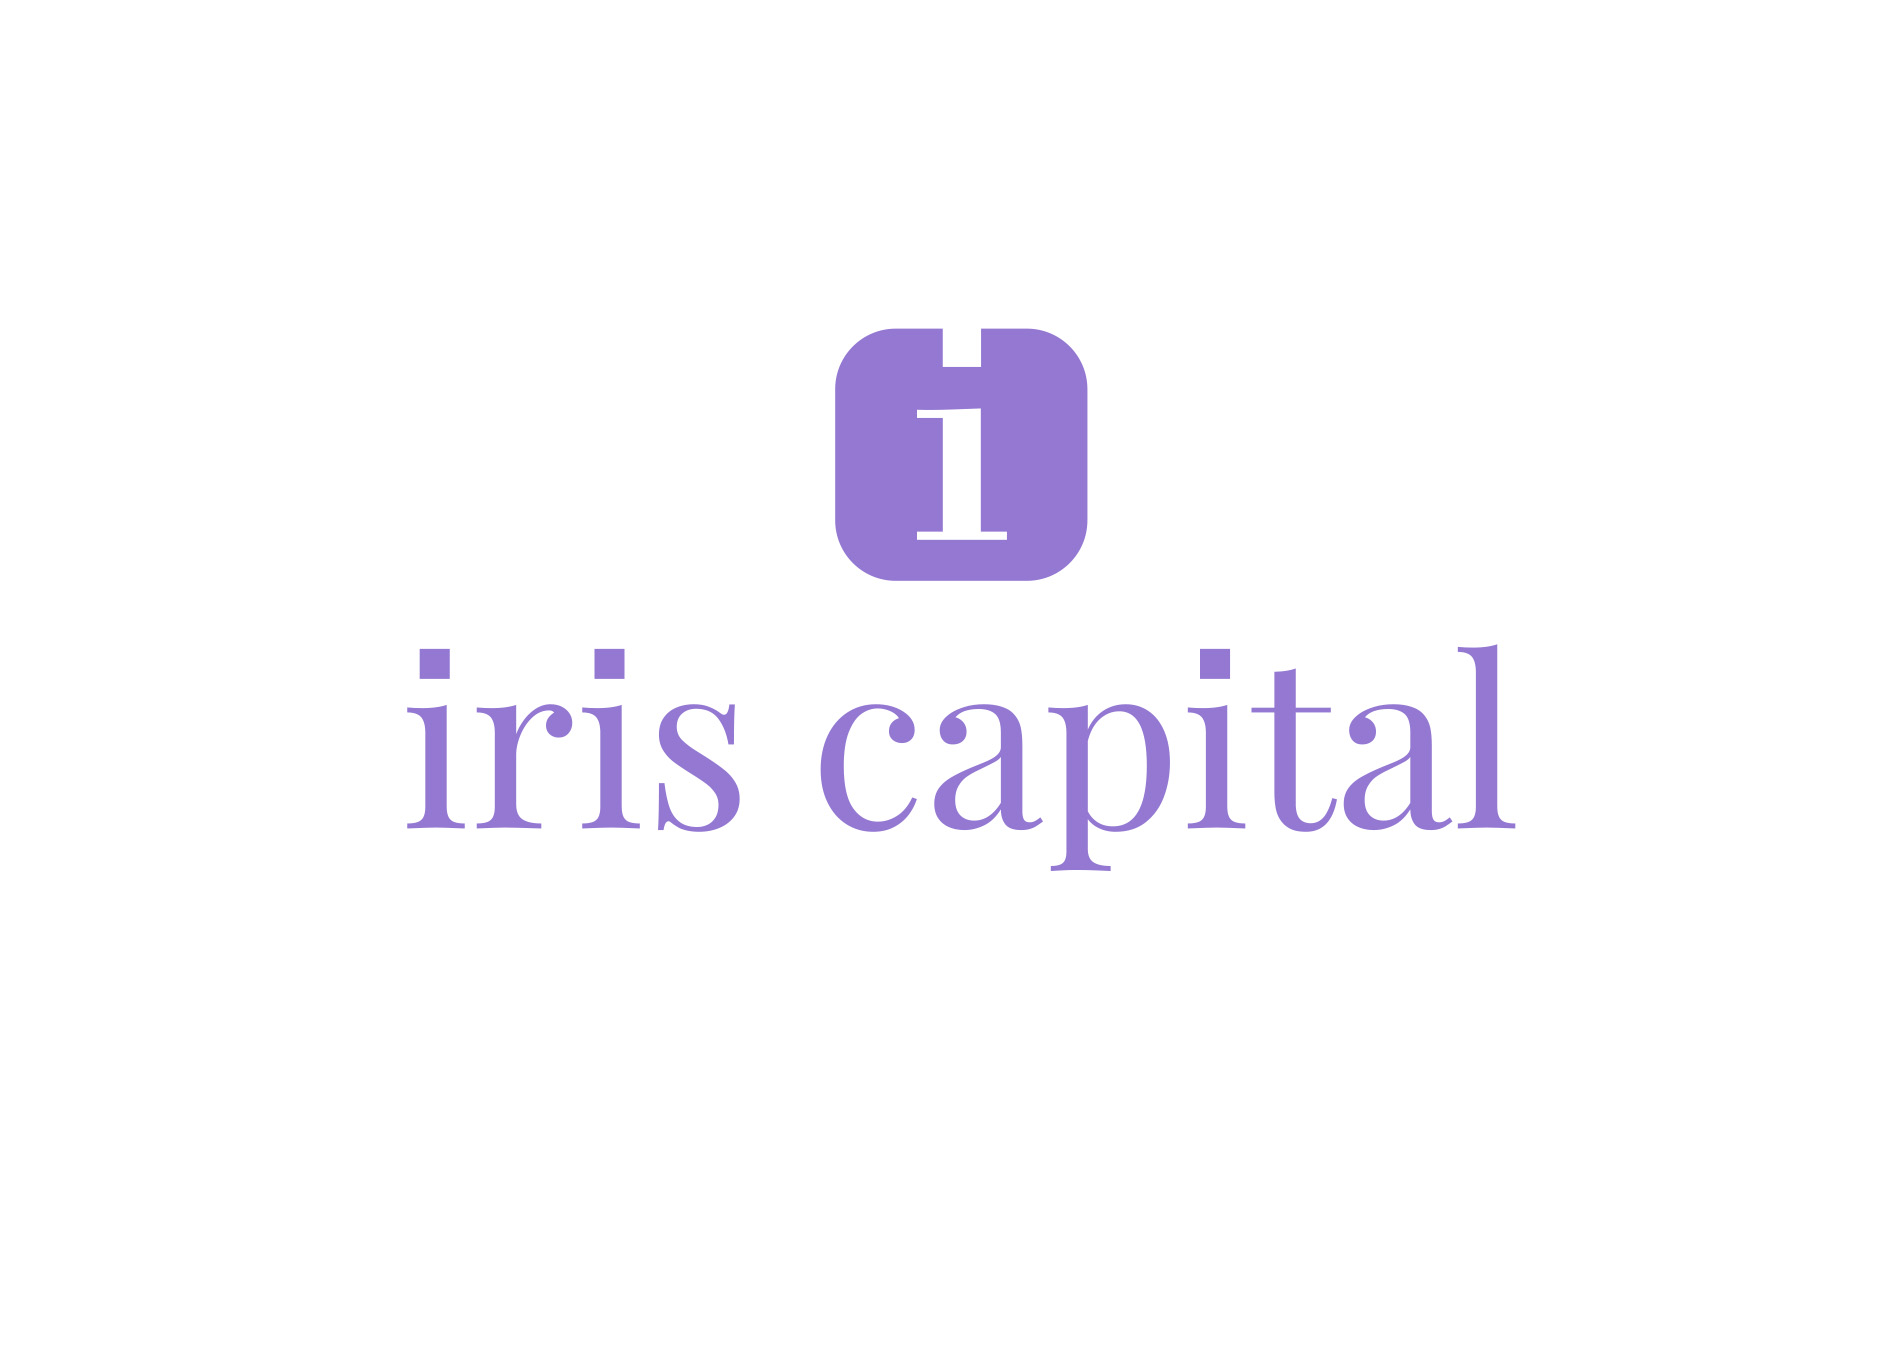 LOGO_Iris-Capital_Pantone_vertical_mid.jpg